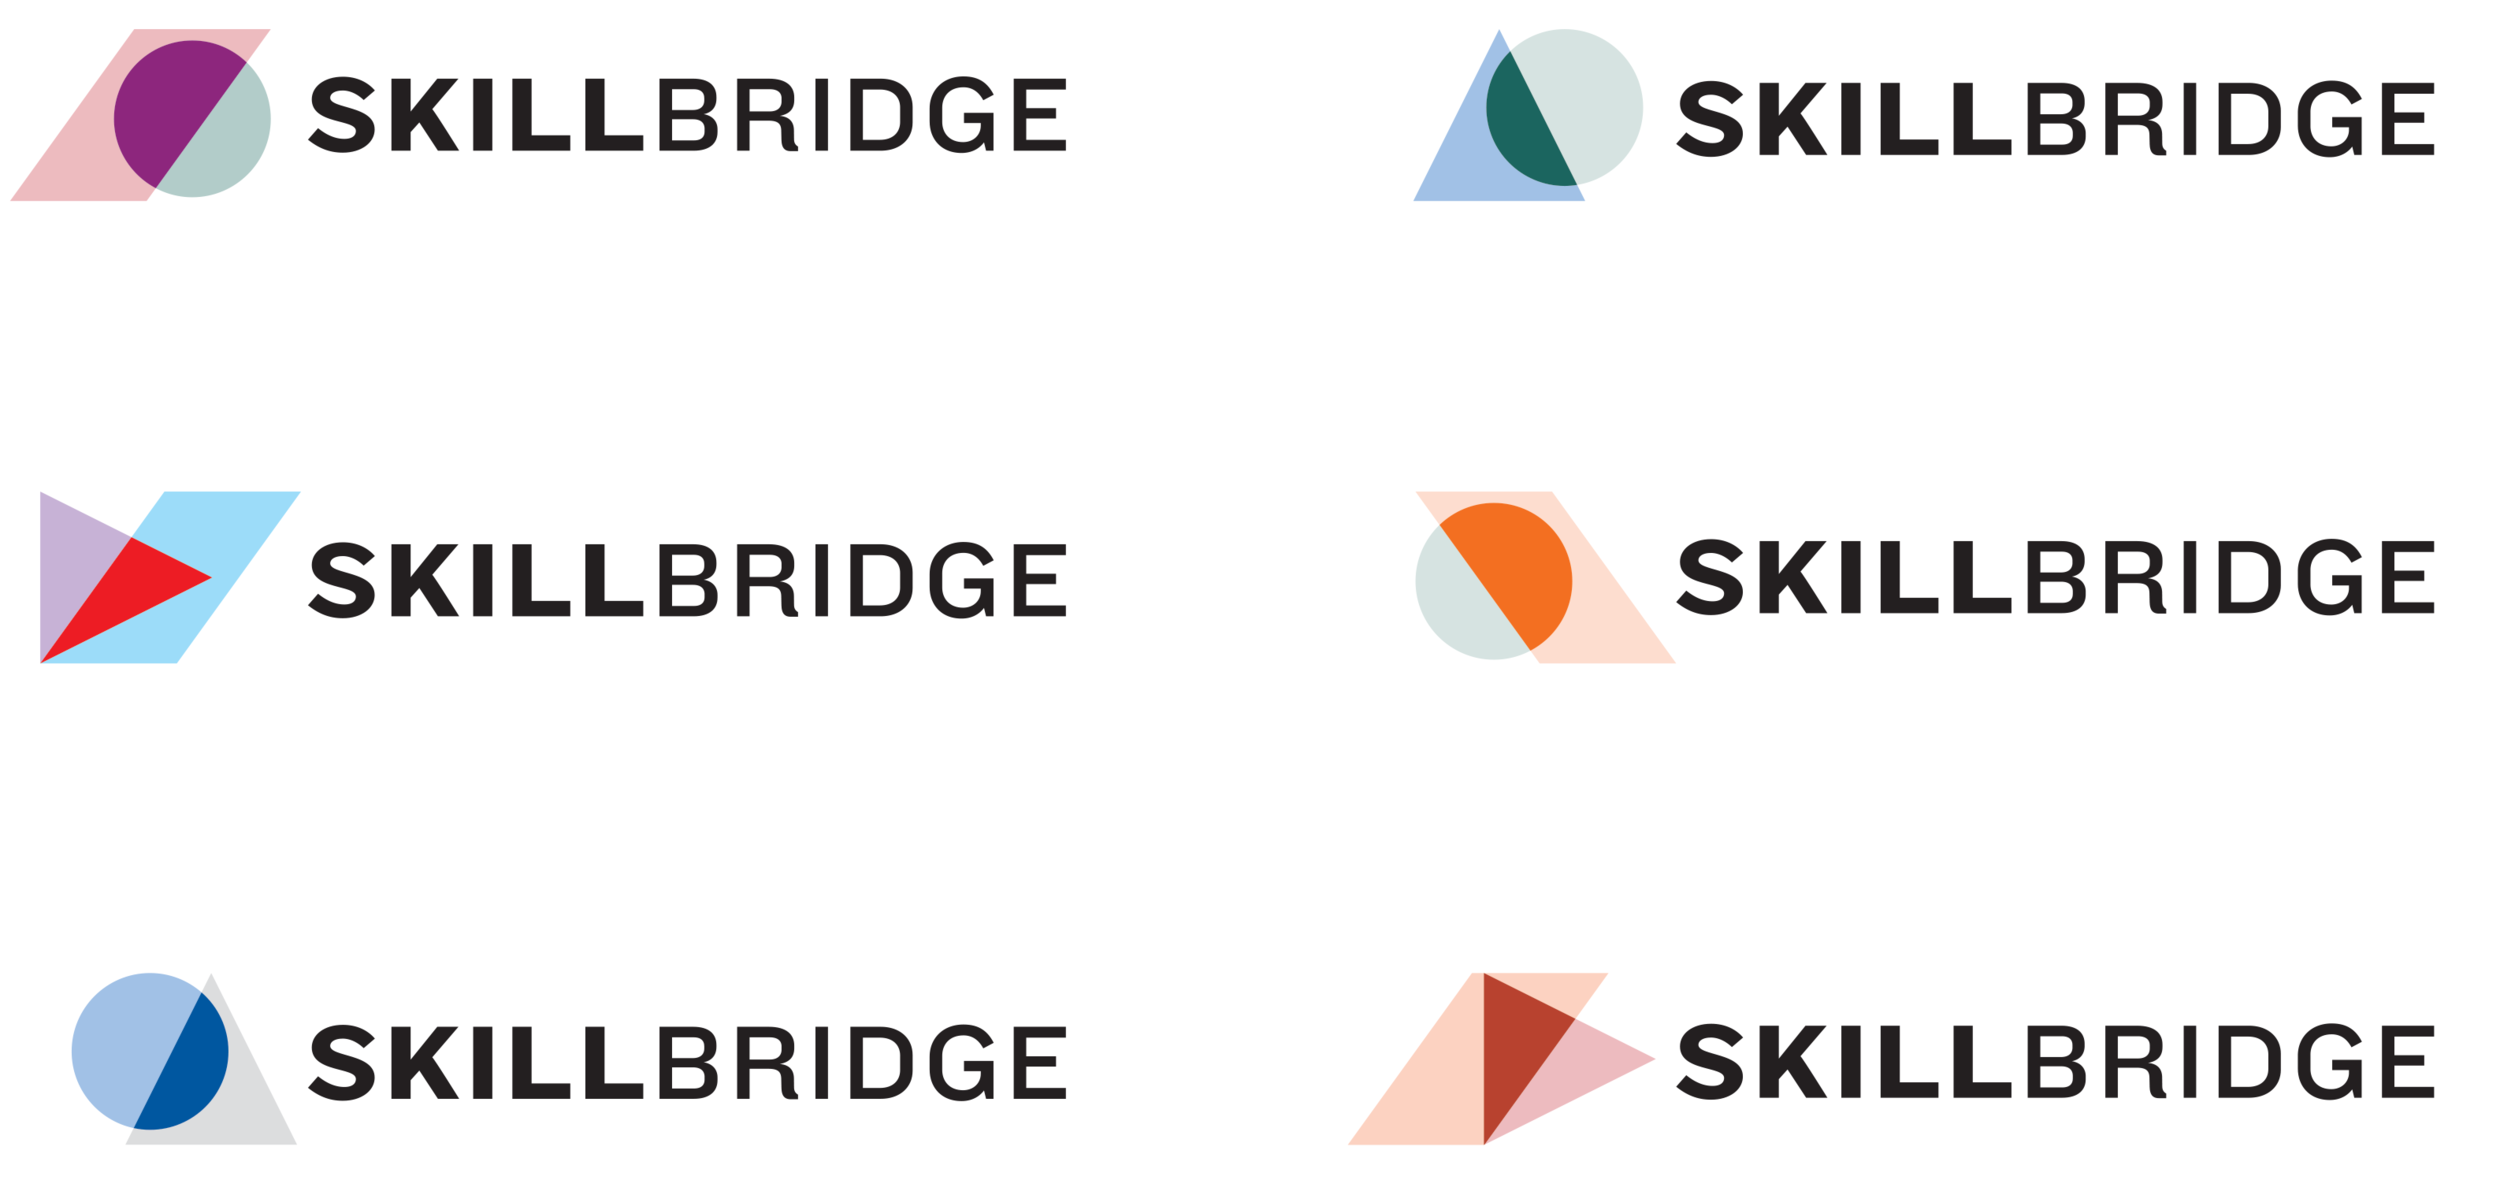 skliibridge-2.png